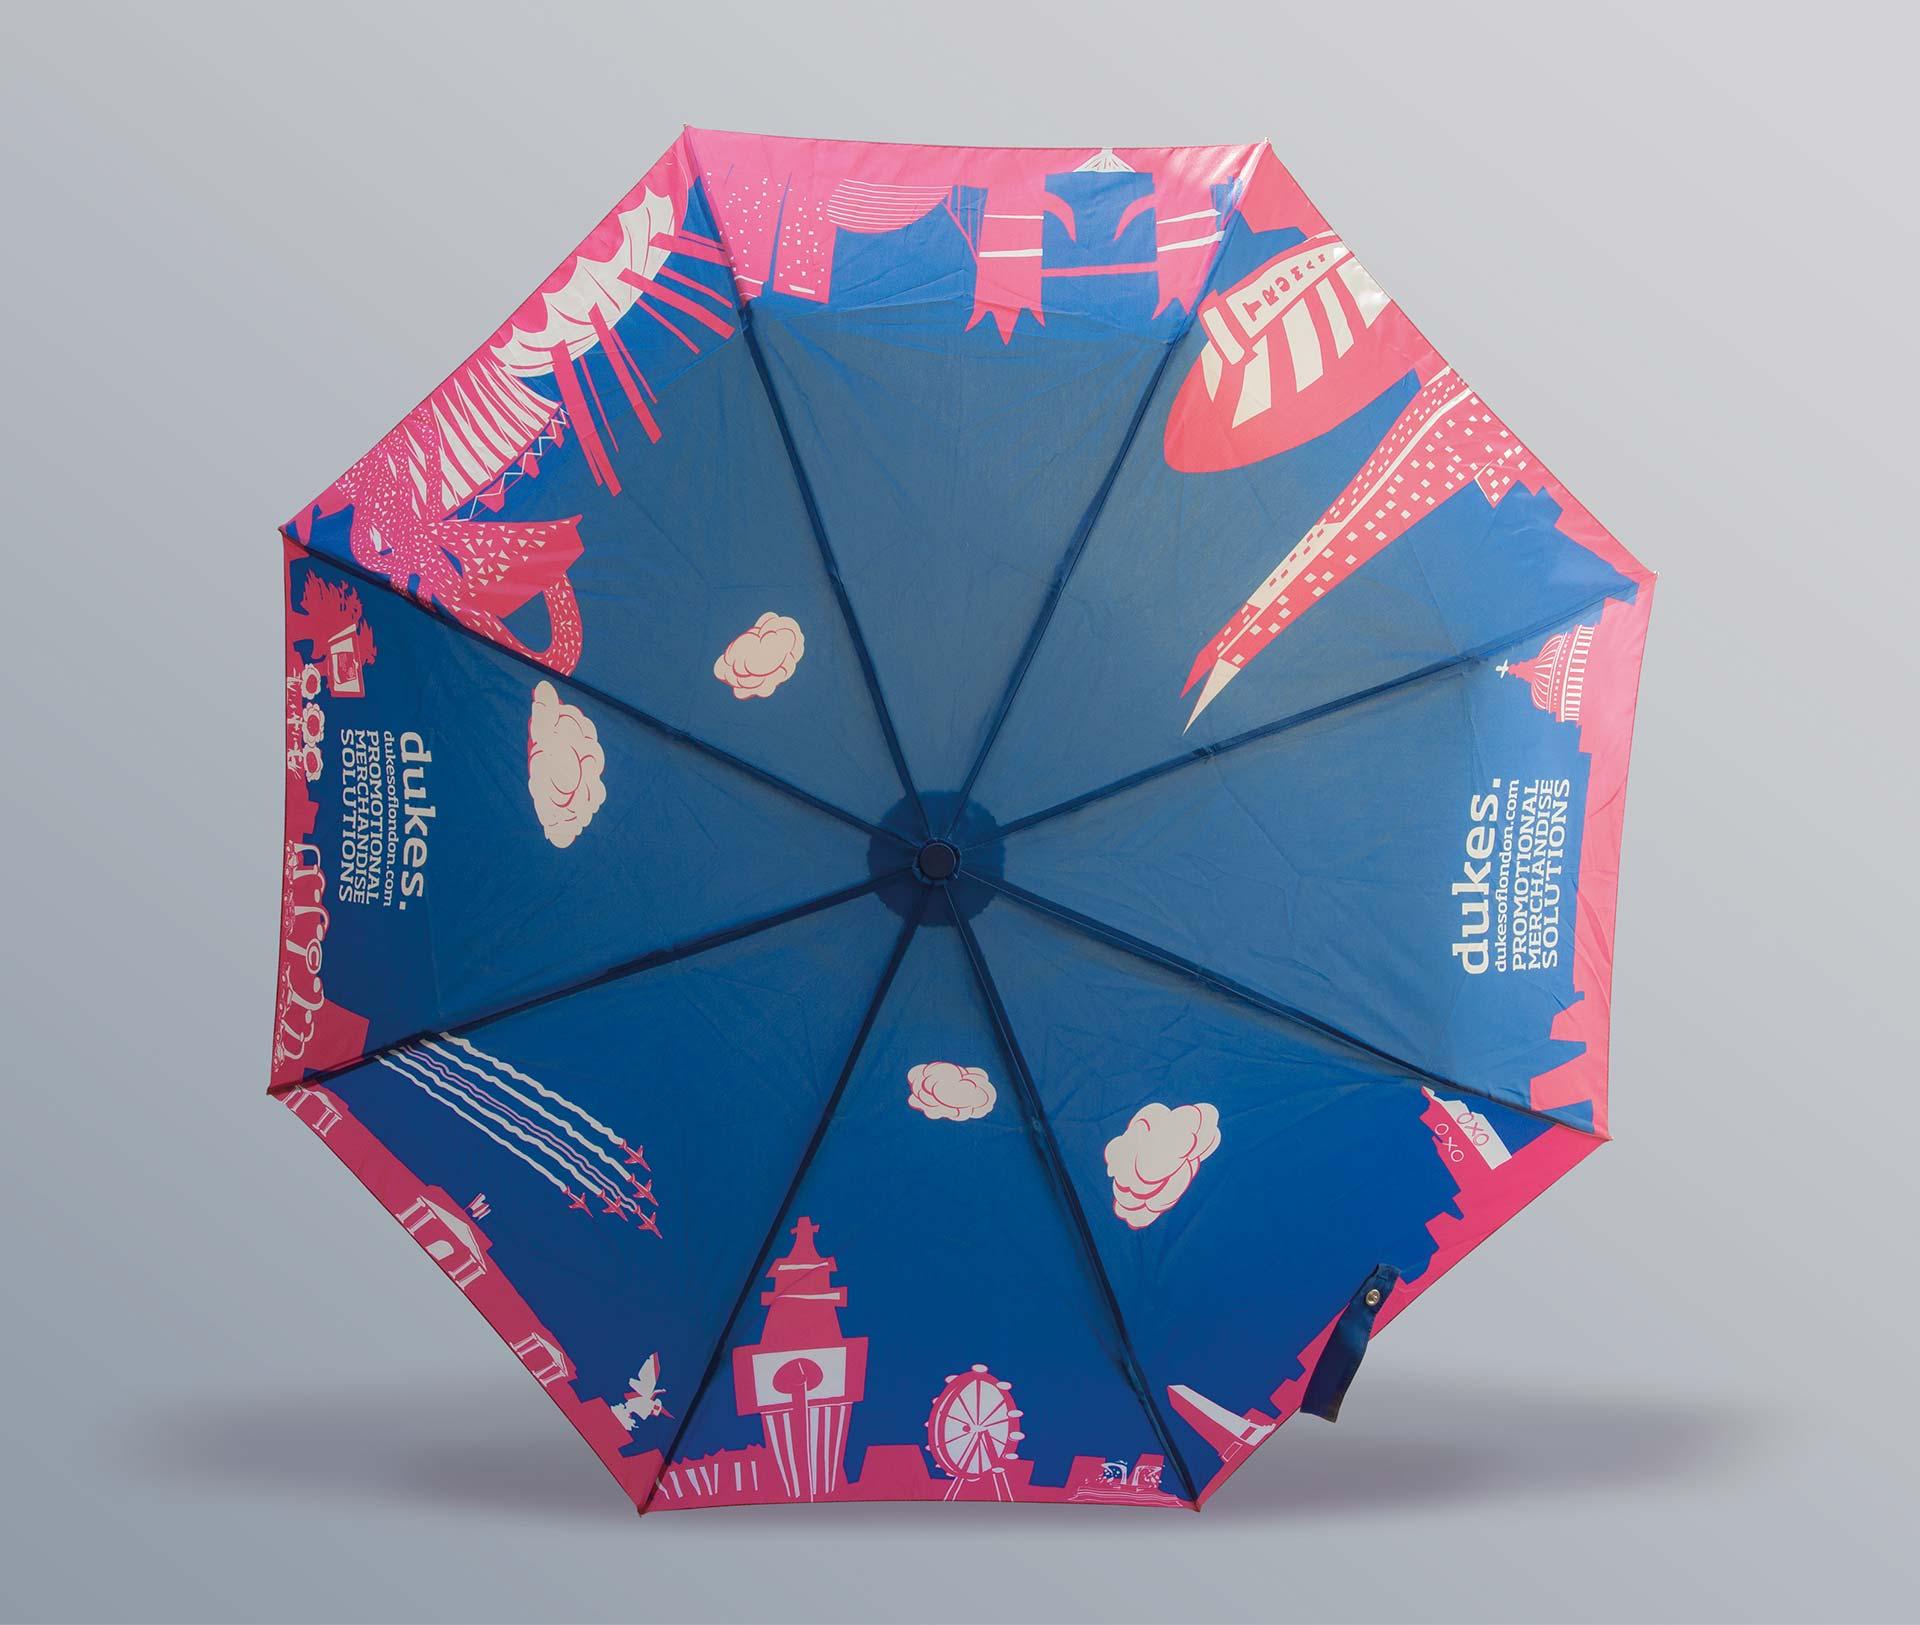 london-artwork-skyline-umbrella-design